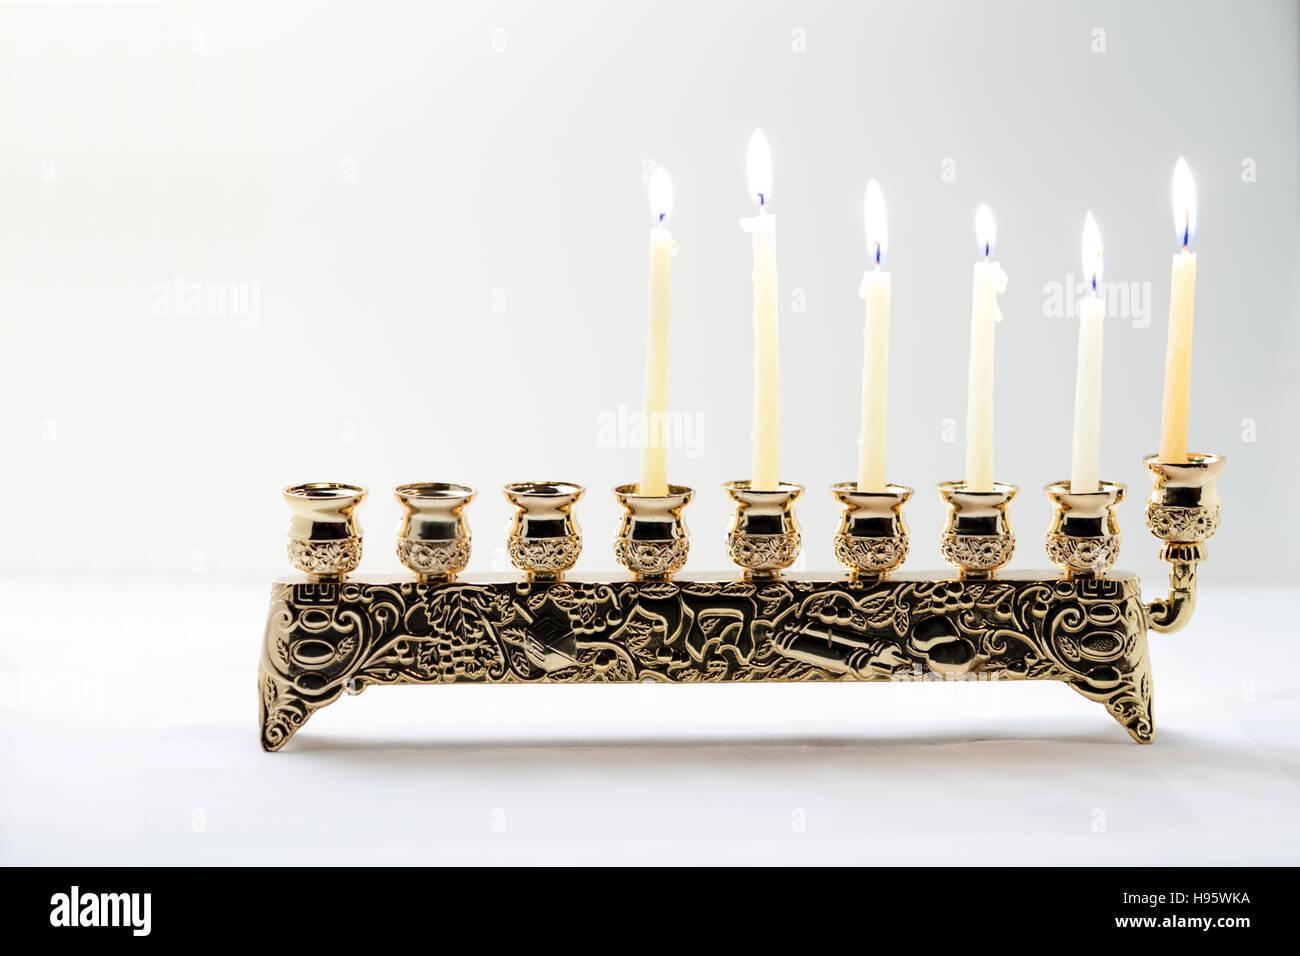 The Symbols Of Hanukkah Nine Branched Menorah Hanukiah Stock Photo